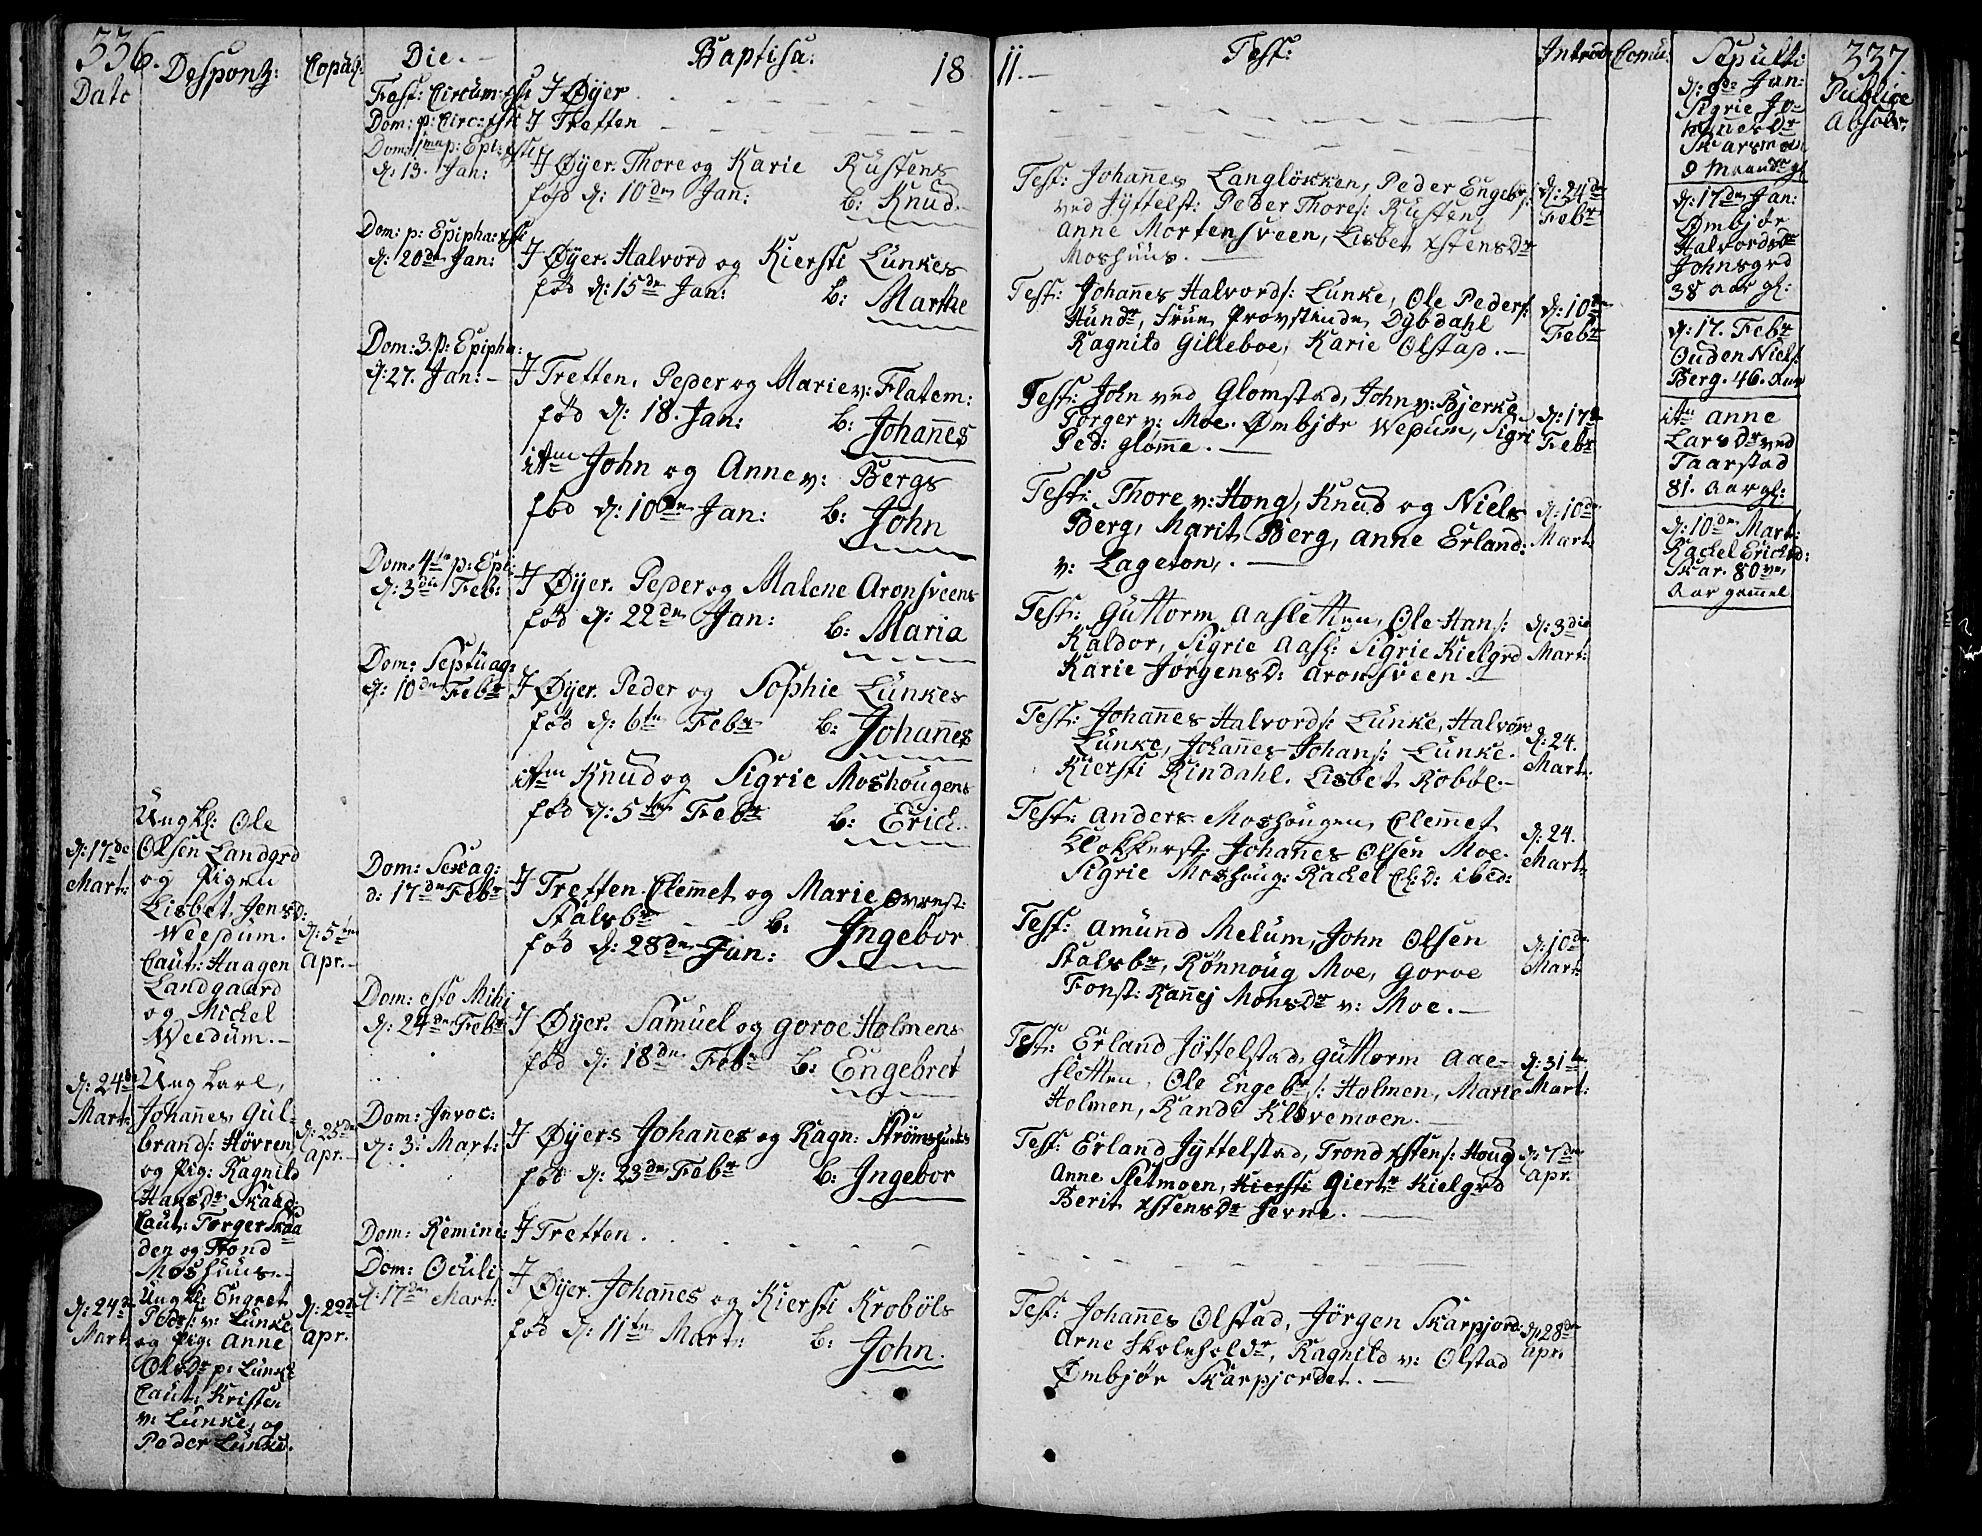 SAH, Øyer prestekontor, Ministerialbok nr. 3, 1784-1824, s. 336-337